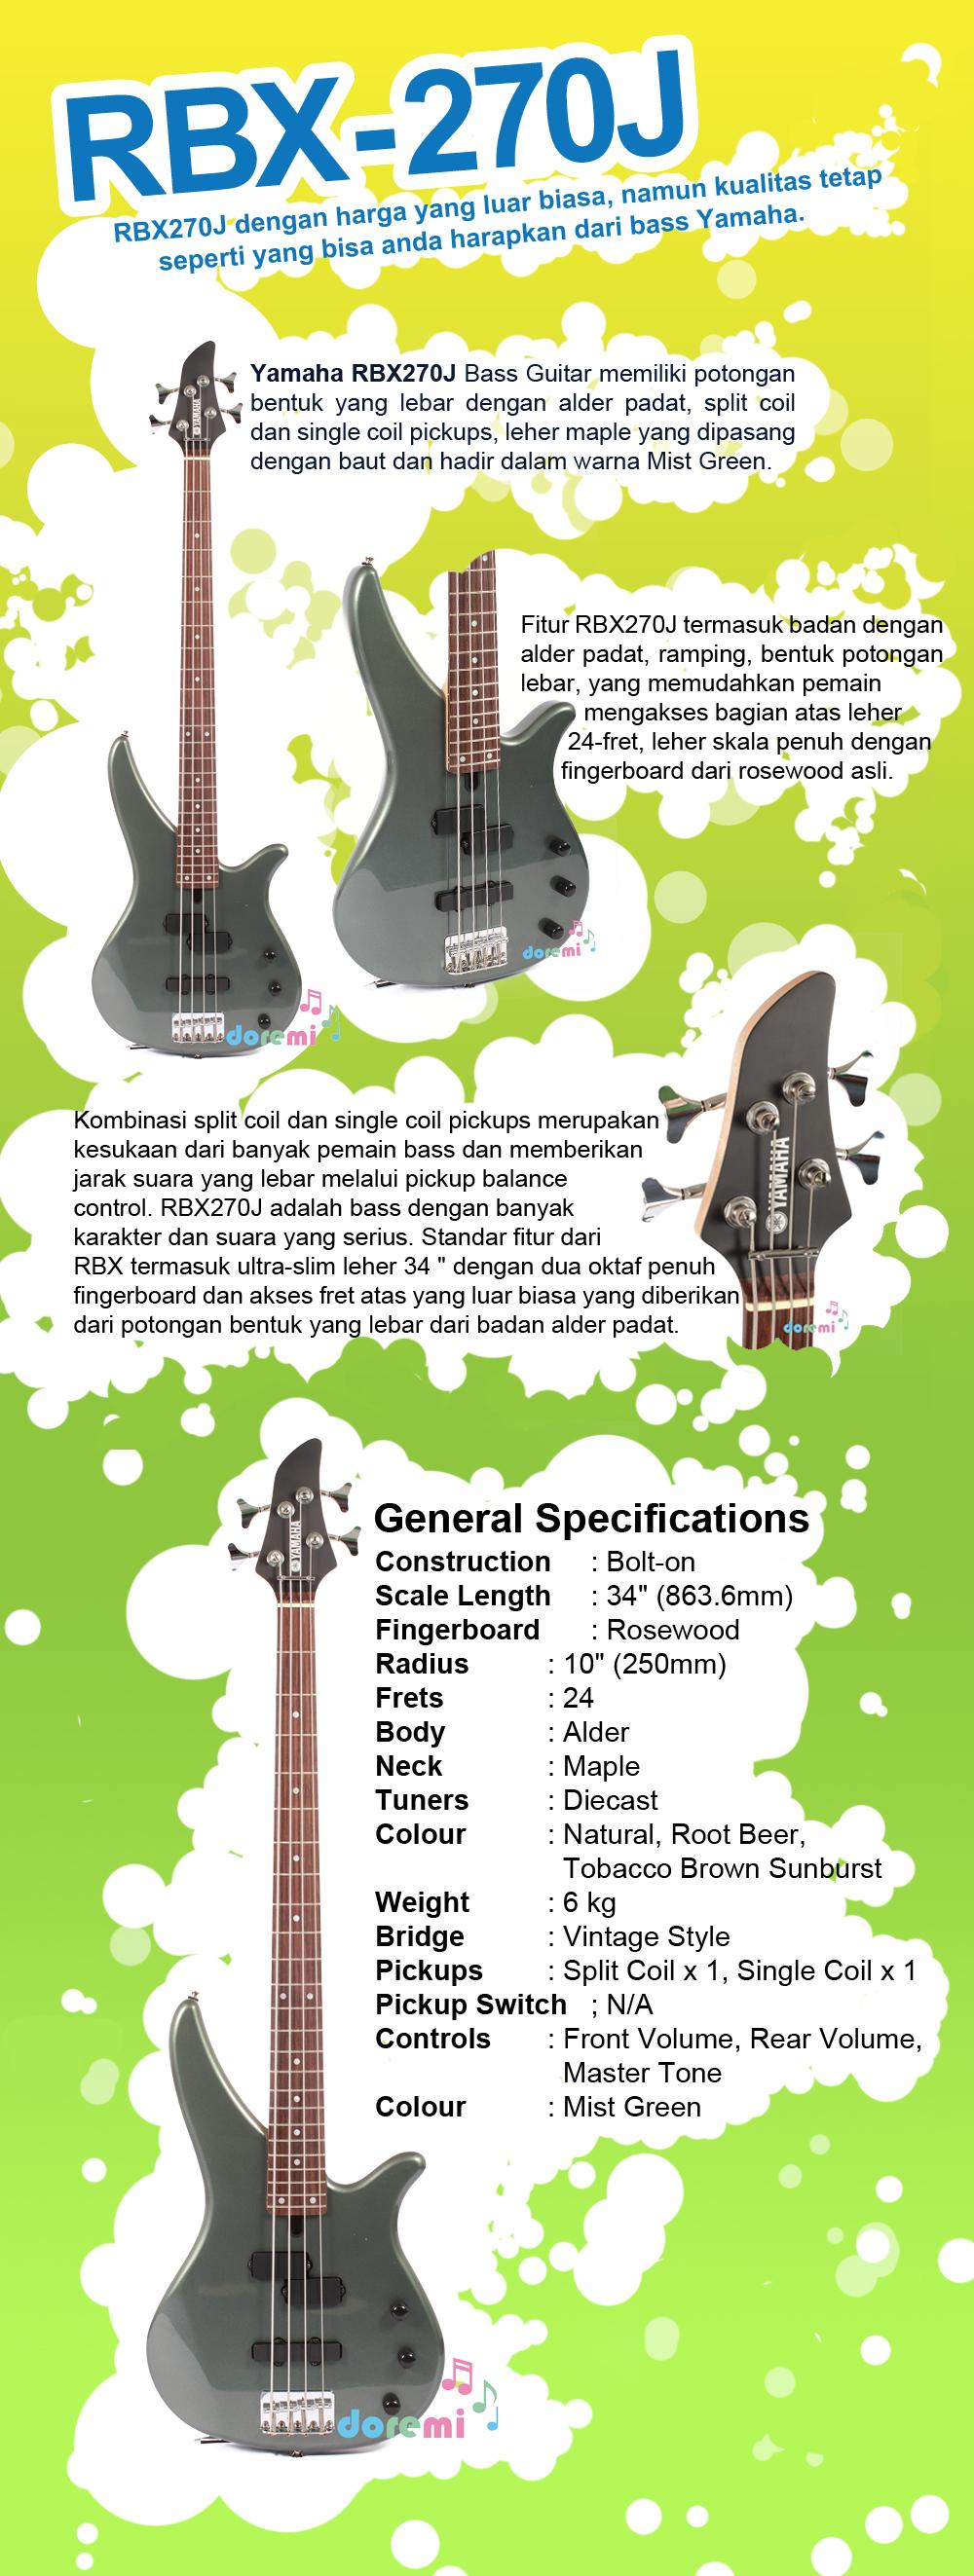 Information Page RBX-270J by petkanna